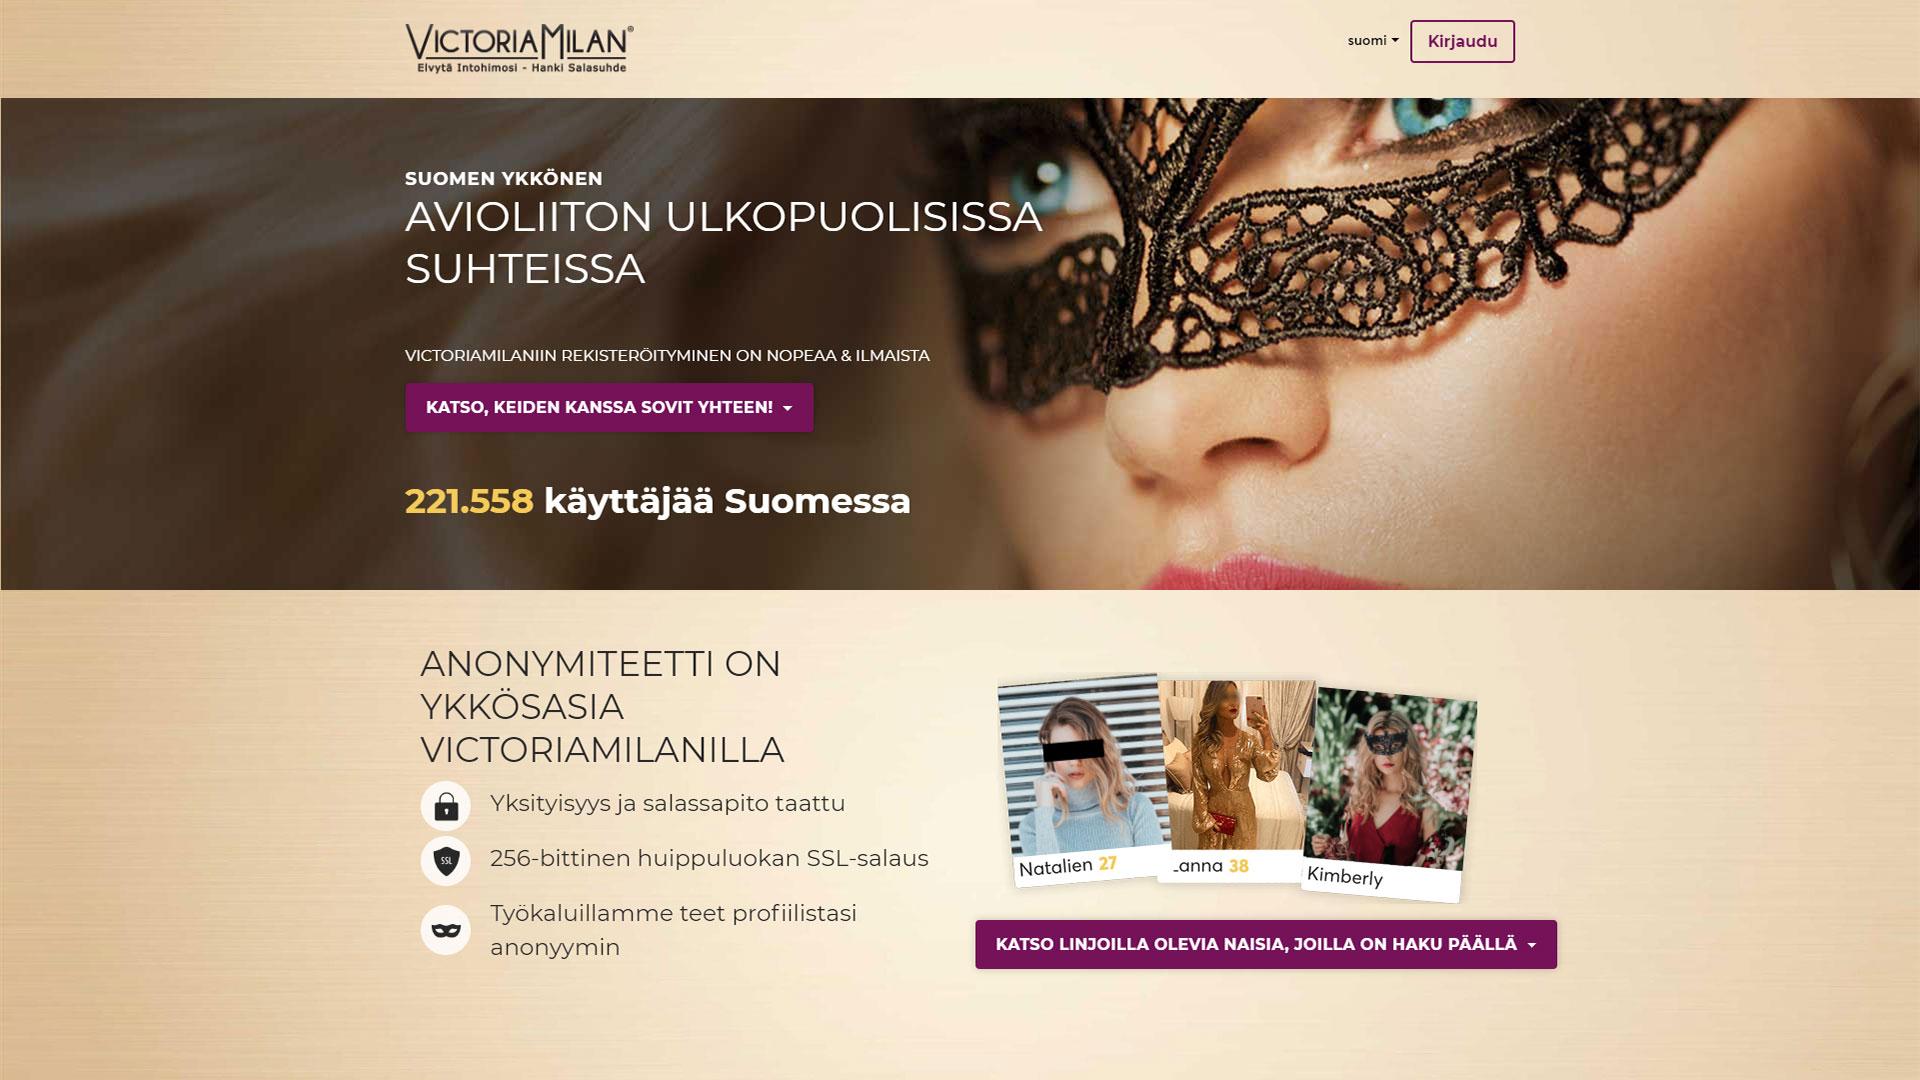 VictoriaMilan - victoriamilan.fi